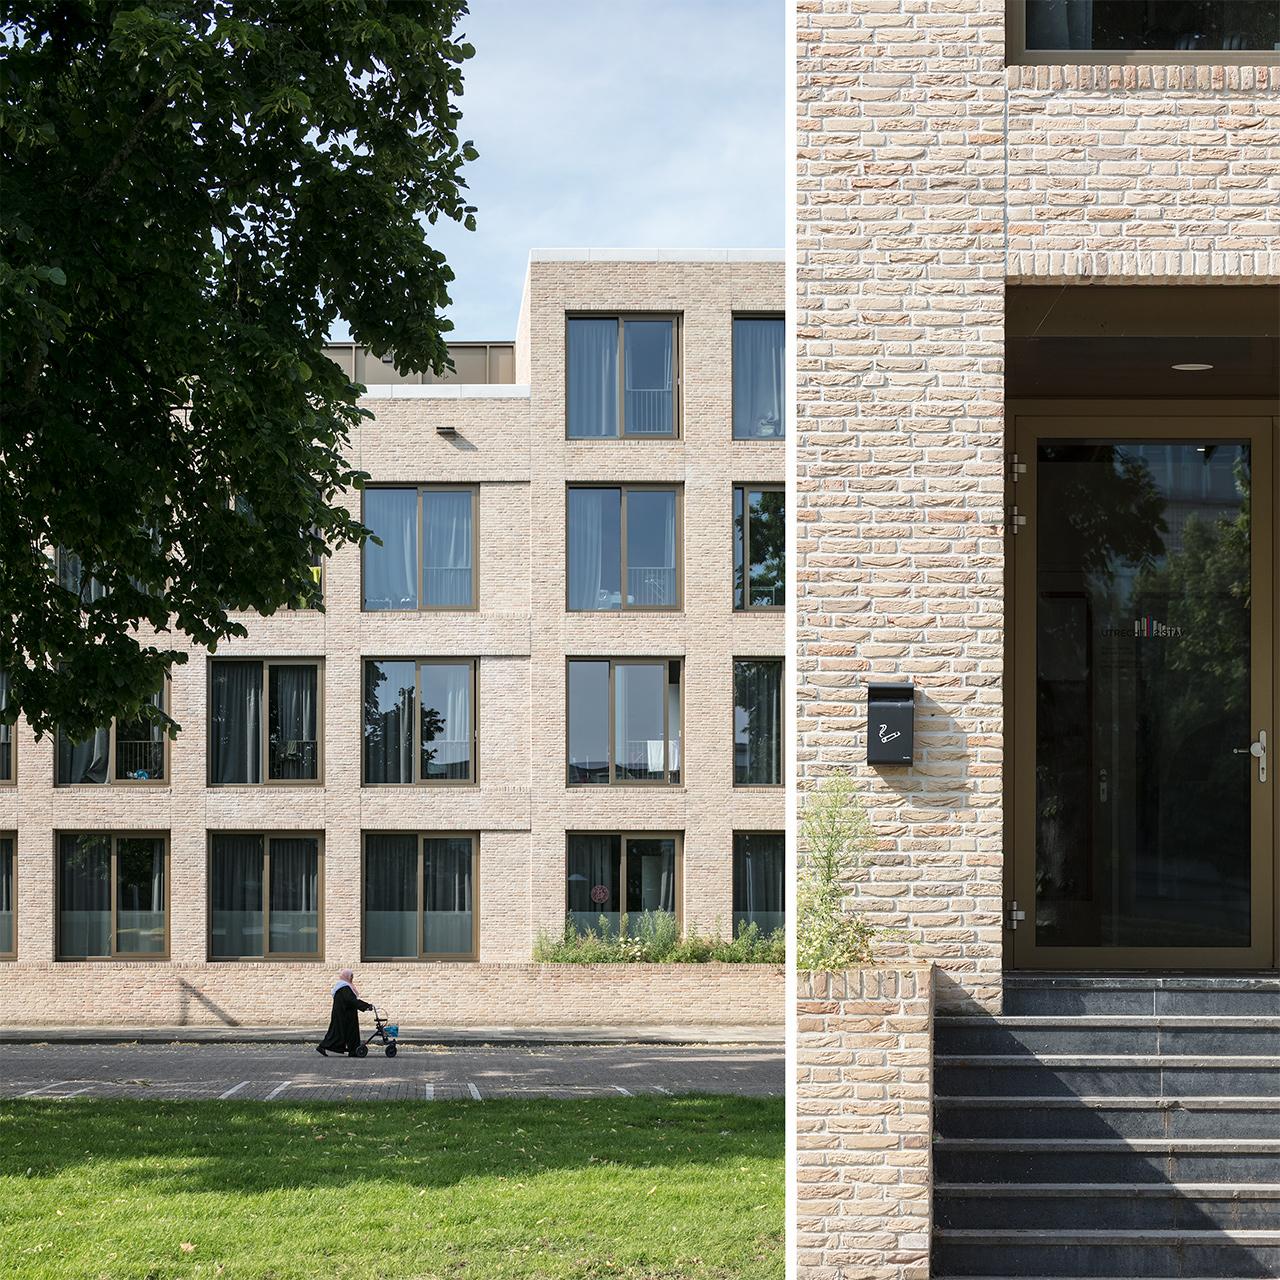 SP2017-Fotoessay-Rietveldprijs-Utrecht3